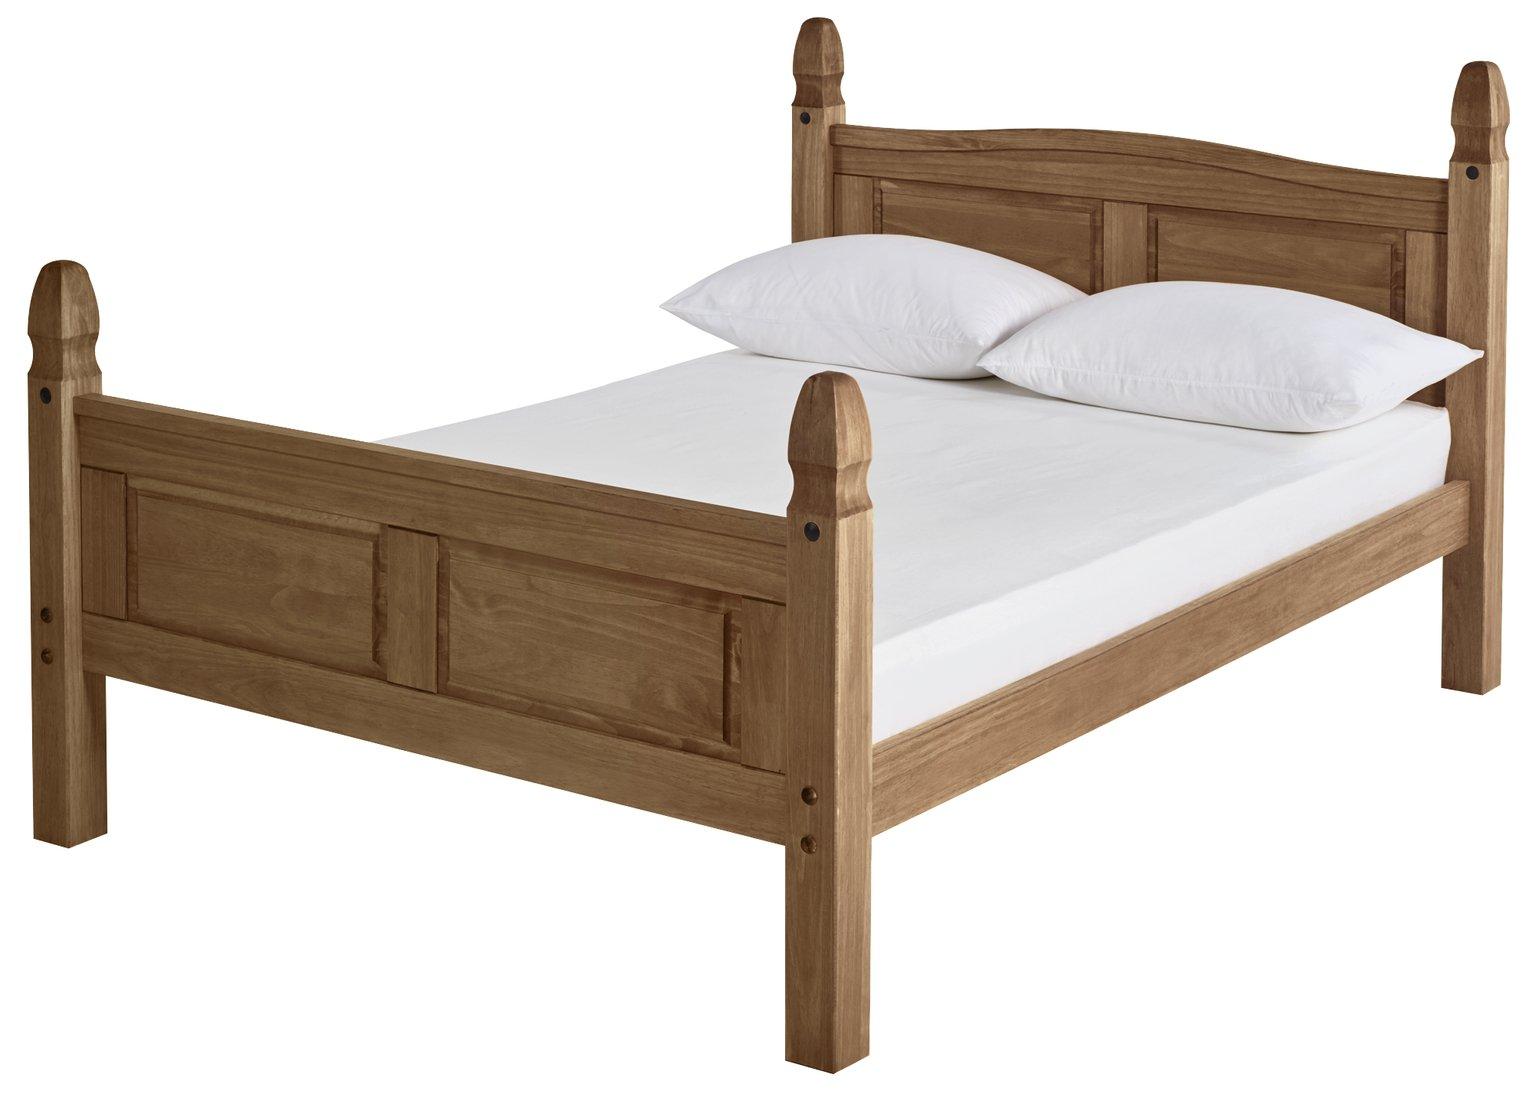 Argos Home Puerto Rico Kingsize Bed Frame - Dark Pine